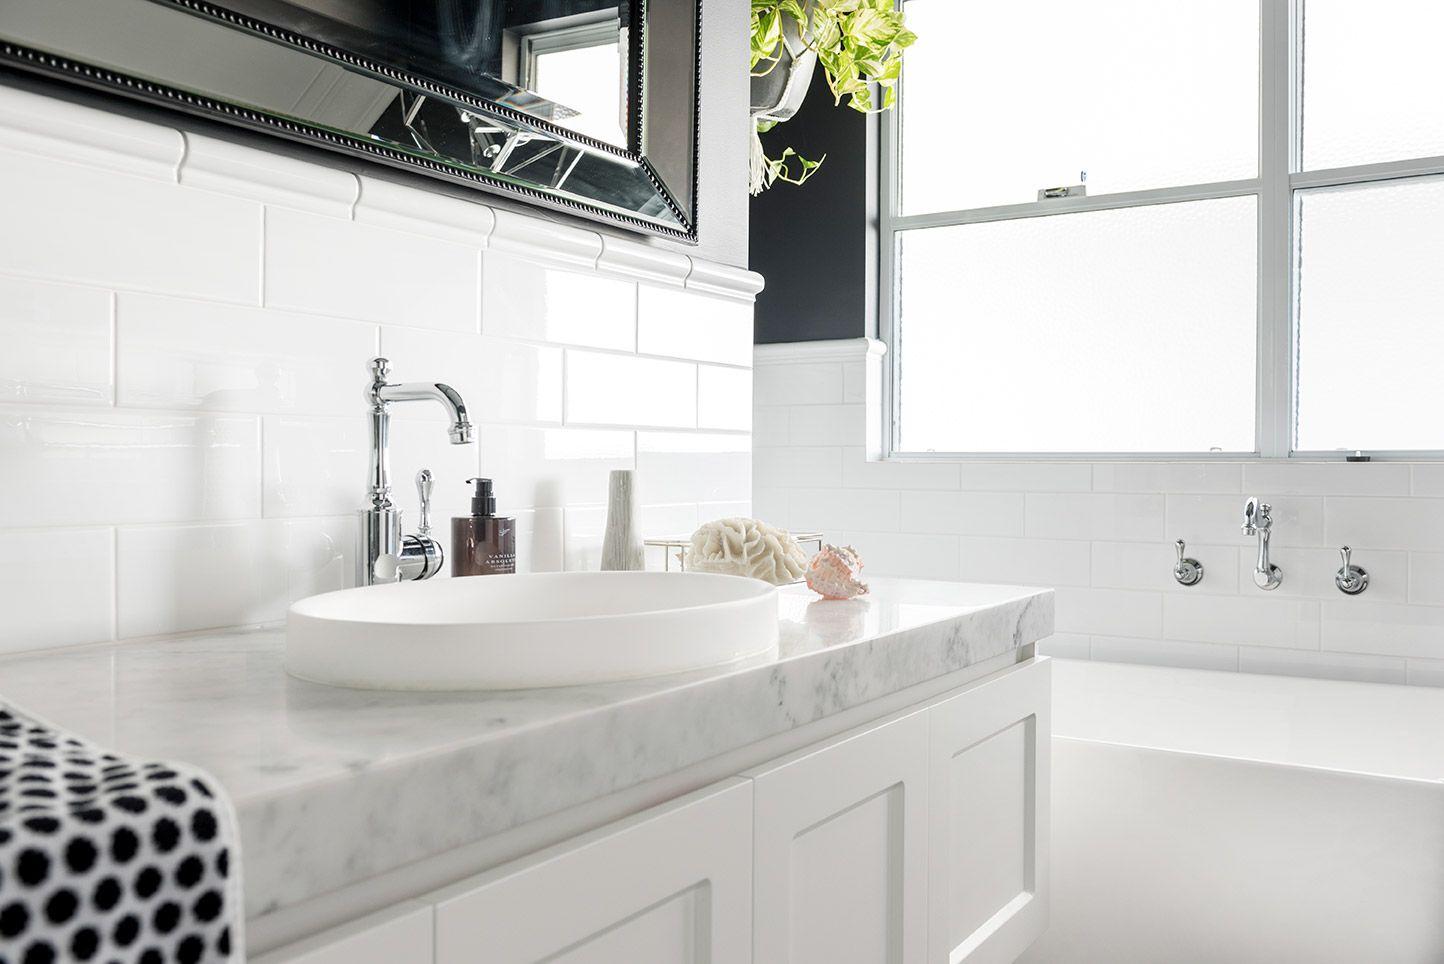 Classic Luxe Bathroom Located In Bunbury Wa Using Dulux Domino